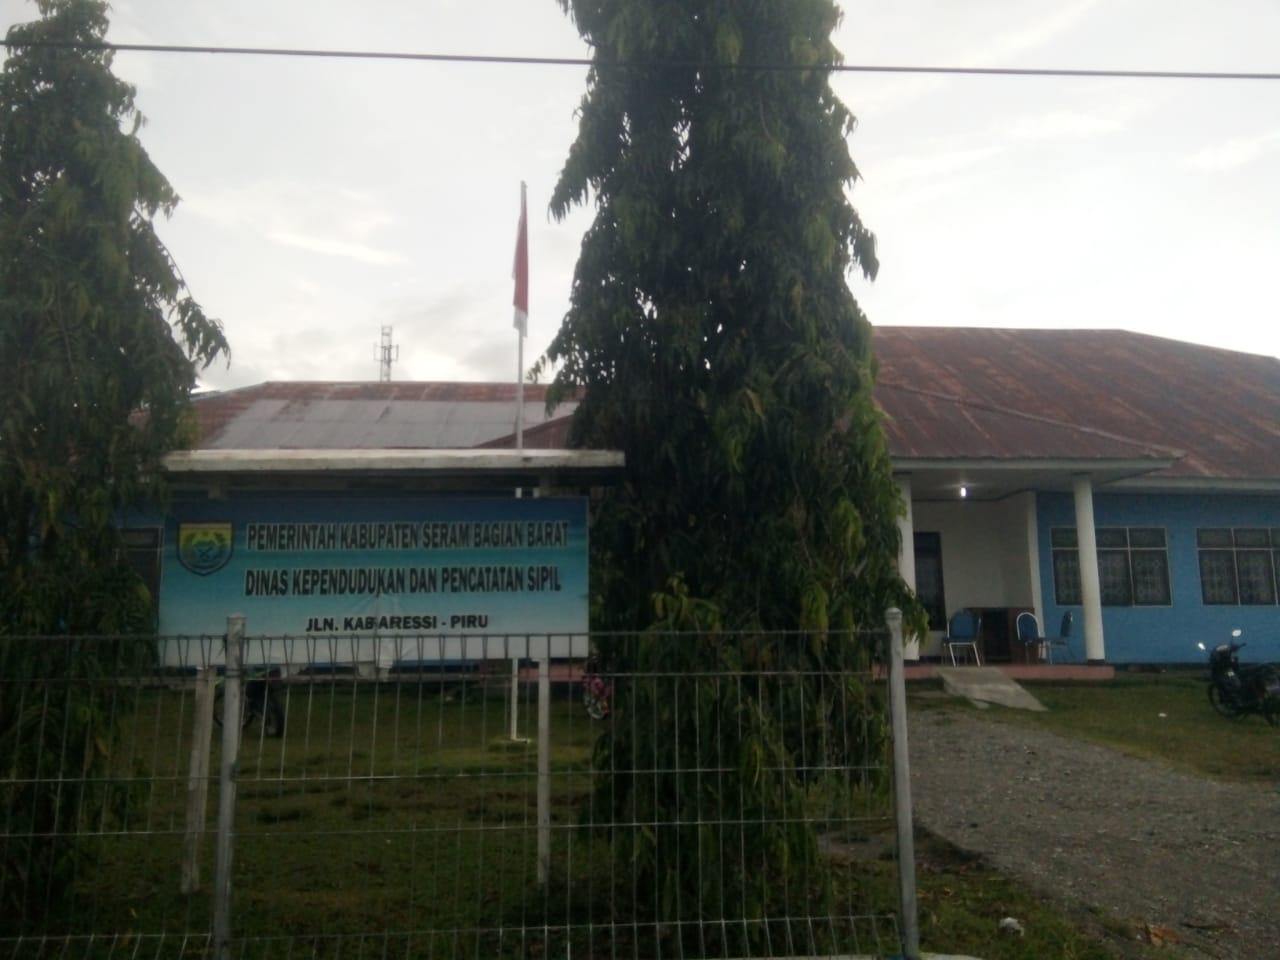 Photo of Ditjen Dukcapil Kemendagri : Kami Akan Putus Jaringan Capil SBB